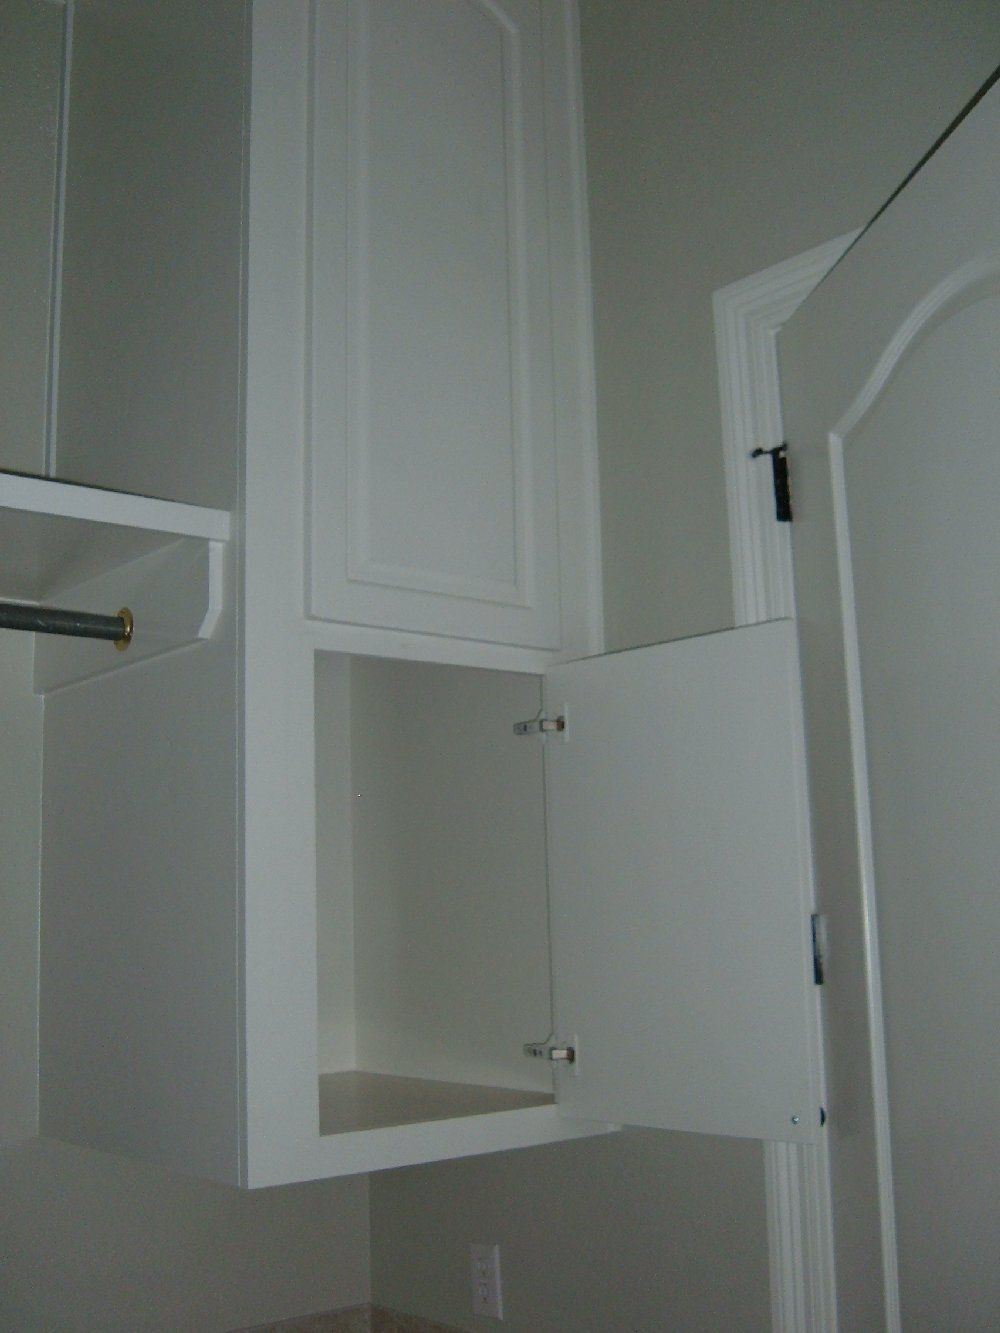 Laundry Chute Bottom Door Ideas  Google Search   Ek